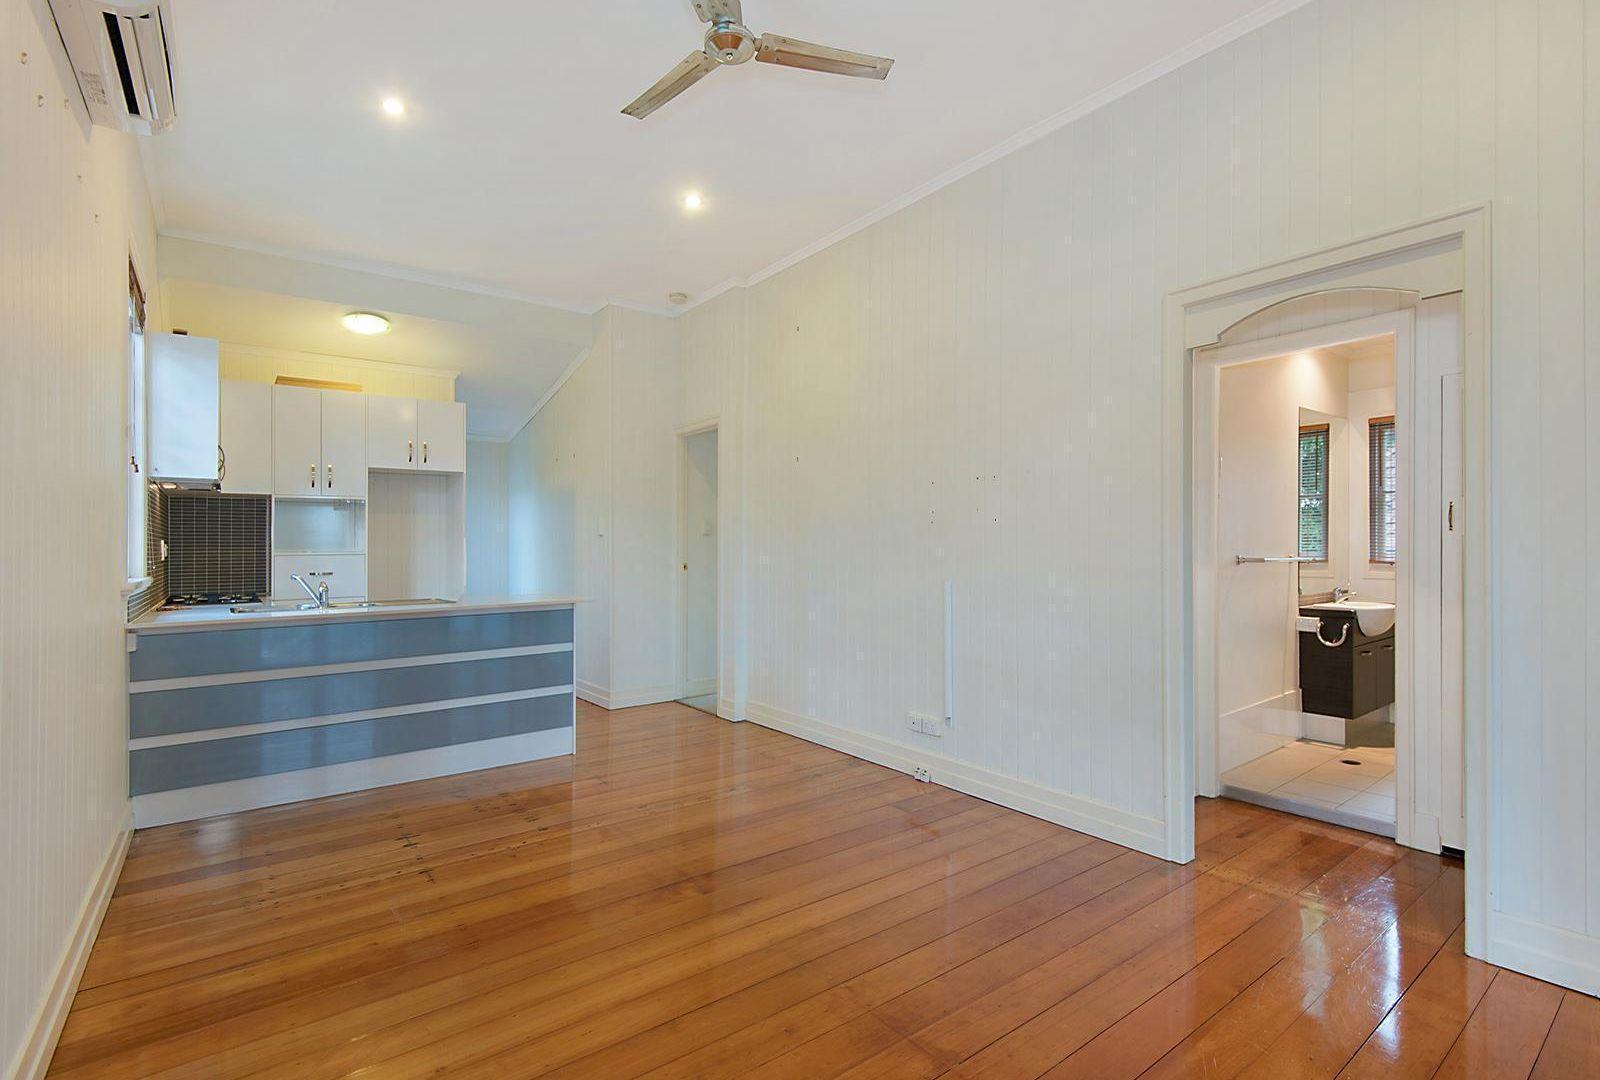 1/20 Figgis Street, Kedron QLD 4031, Image 1